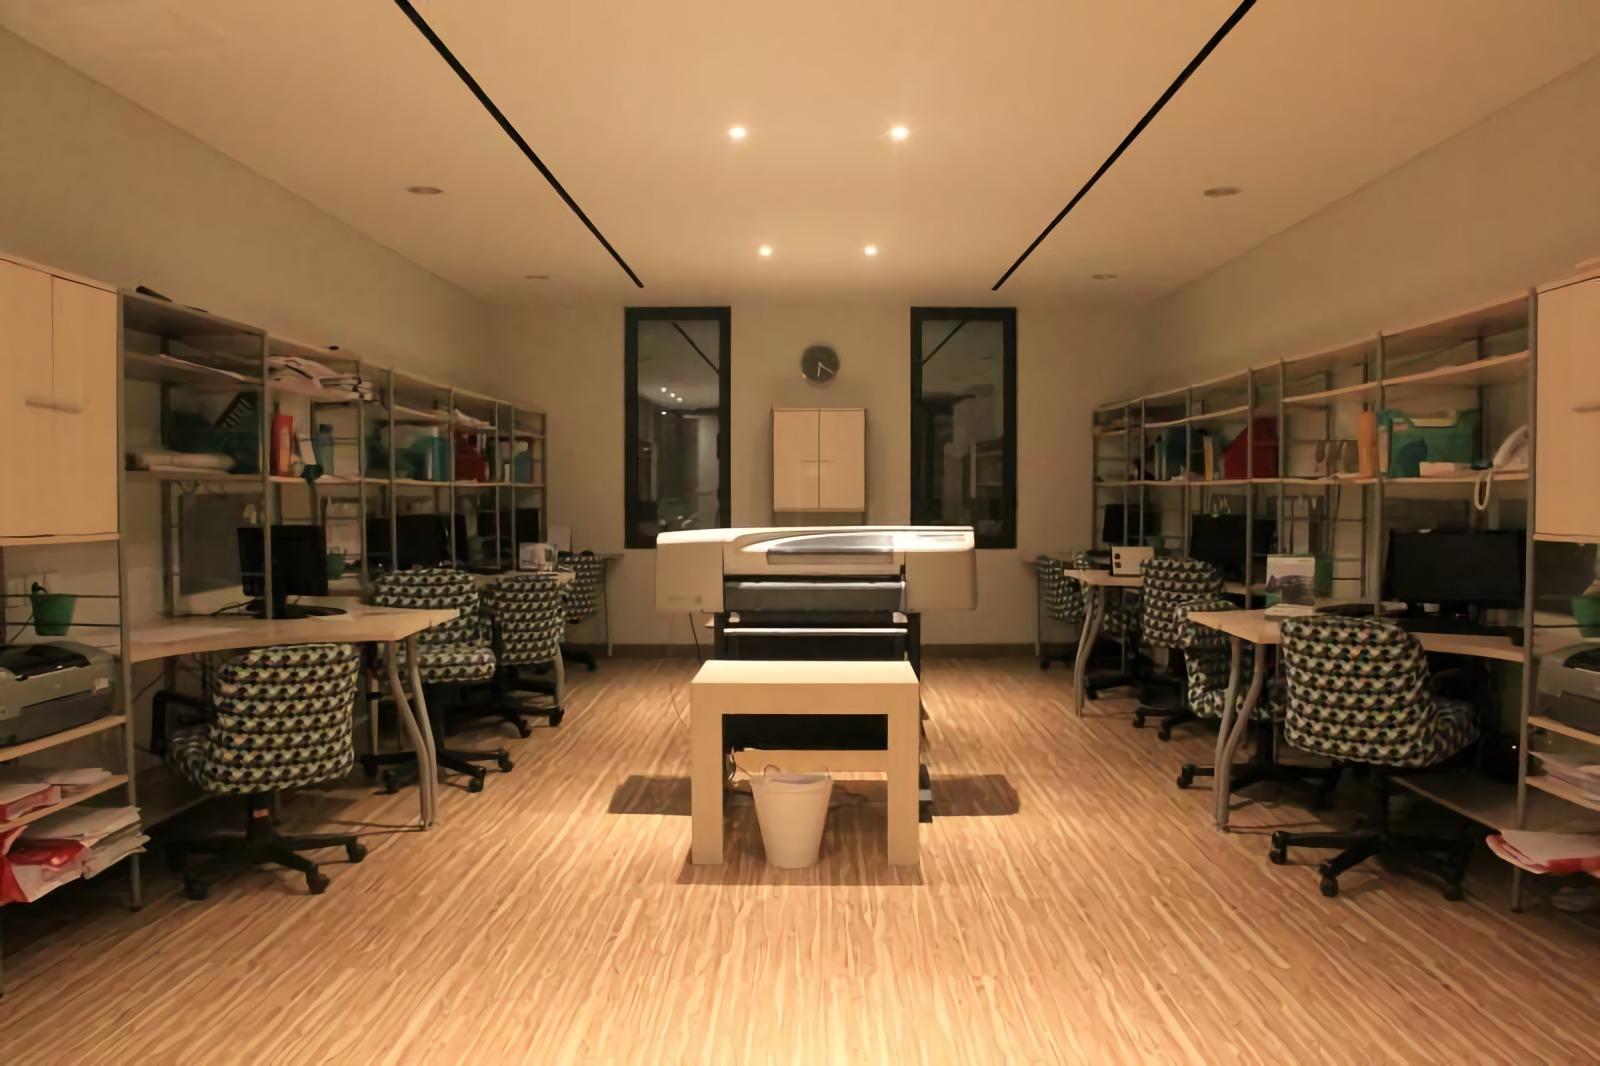 Ruang kerja Sonny Sutanto Architects New Office di Sunter, Jakarta Utara (Sumber: arsitag.com)